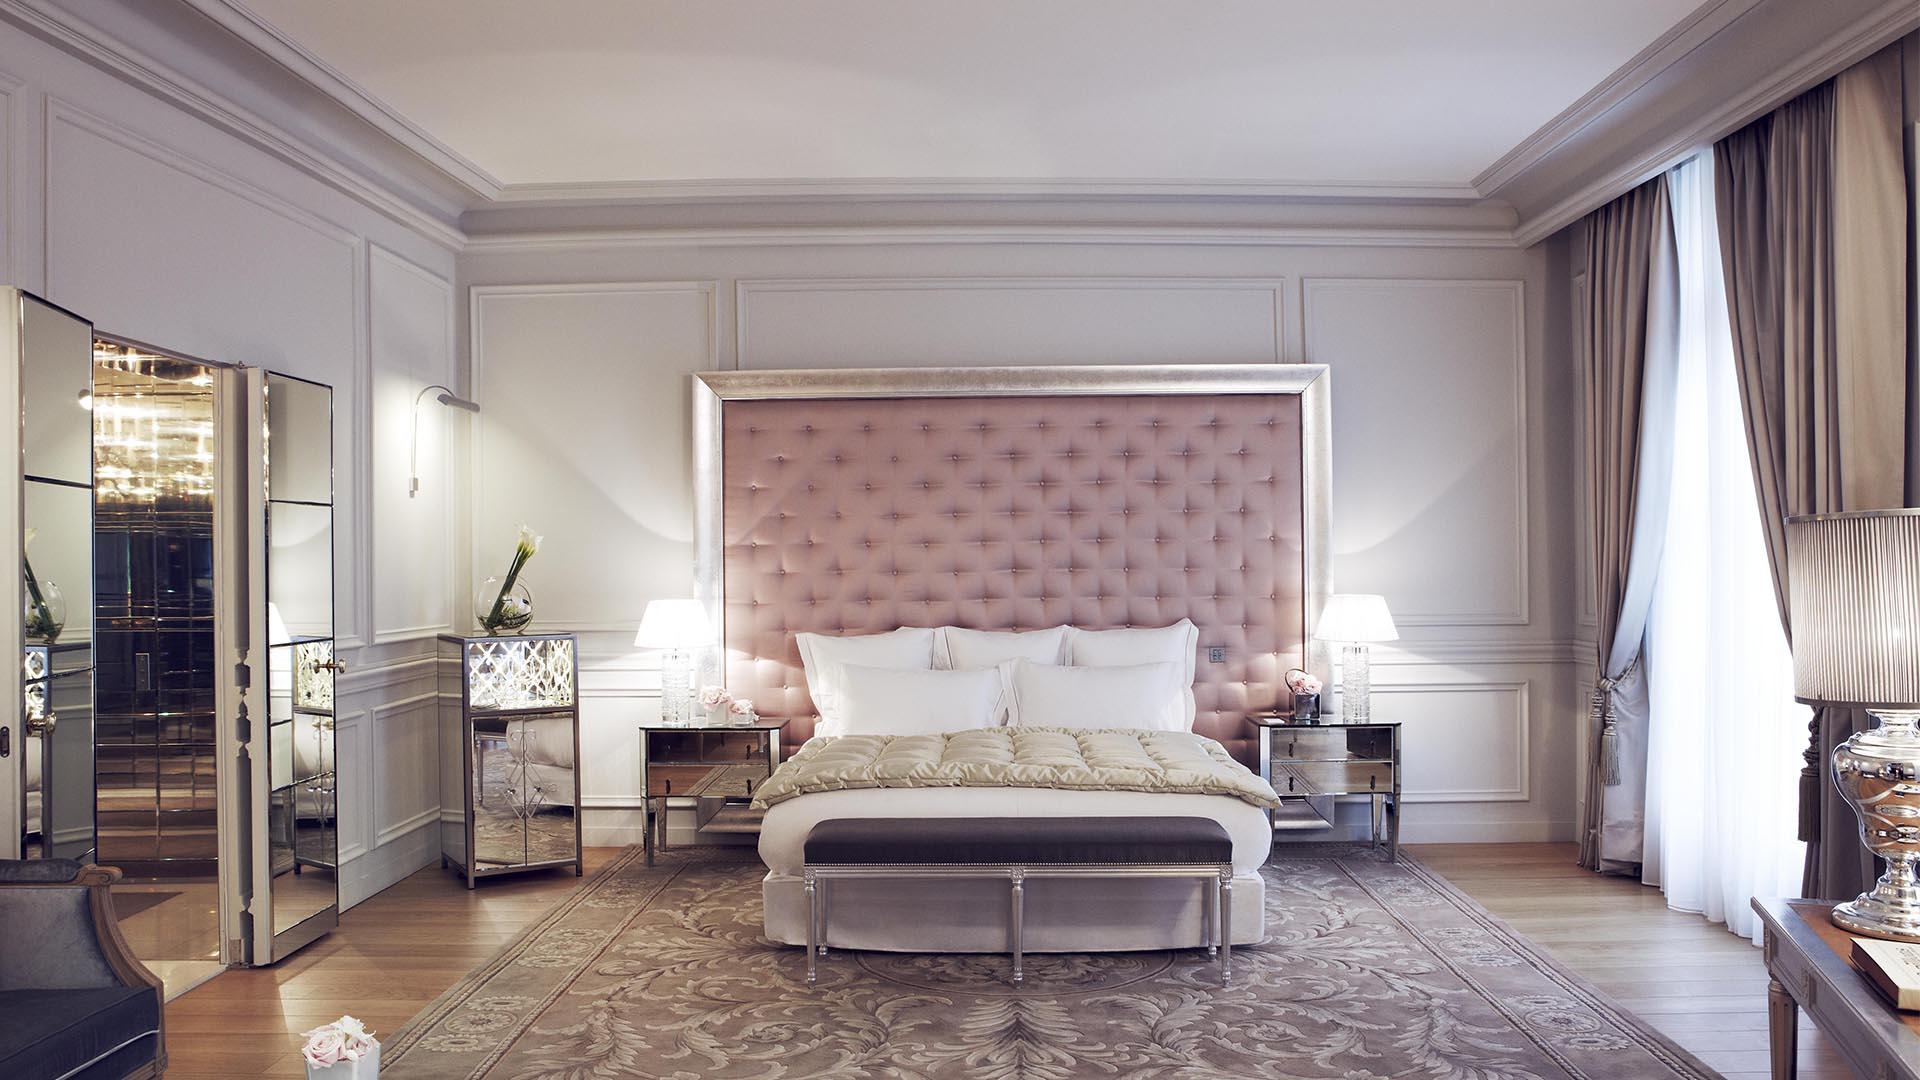 Photo of اتاق توئین، دبل و تریپل هتل ها را بشناسیم